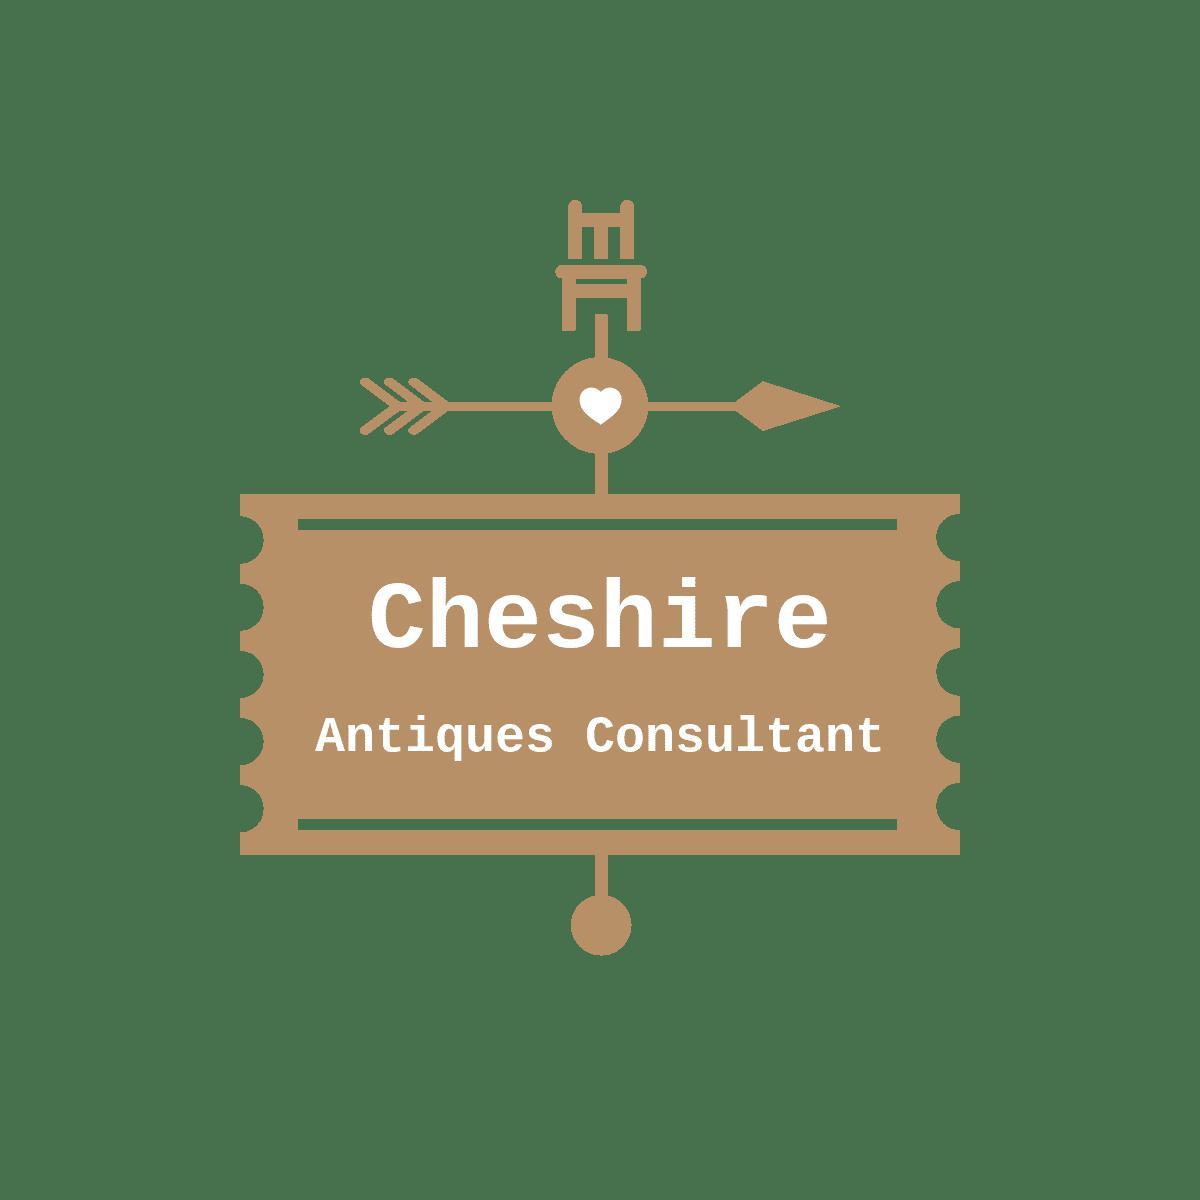 Cheshire Antiques Consultant image (1 of 1)